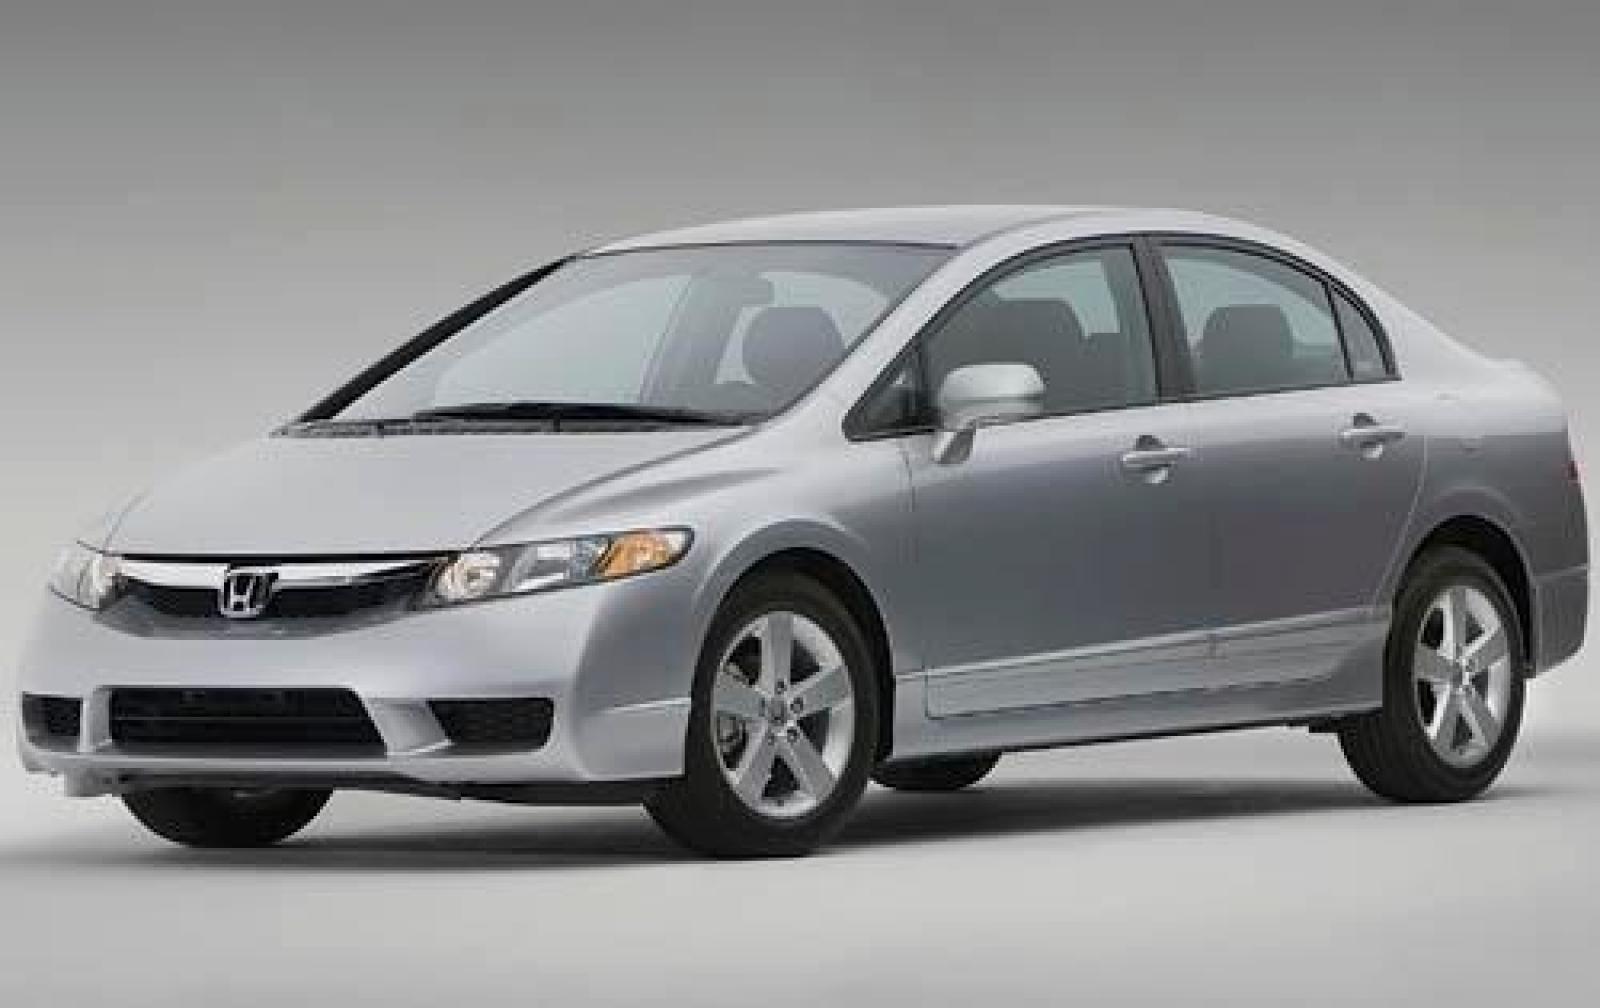 800 1024 1280 1600 Origin 2010 Honda Civic ...